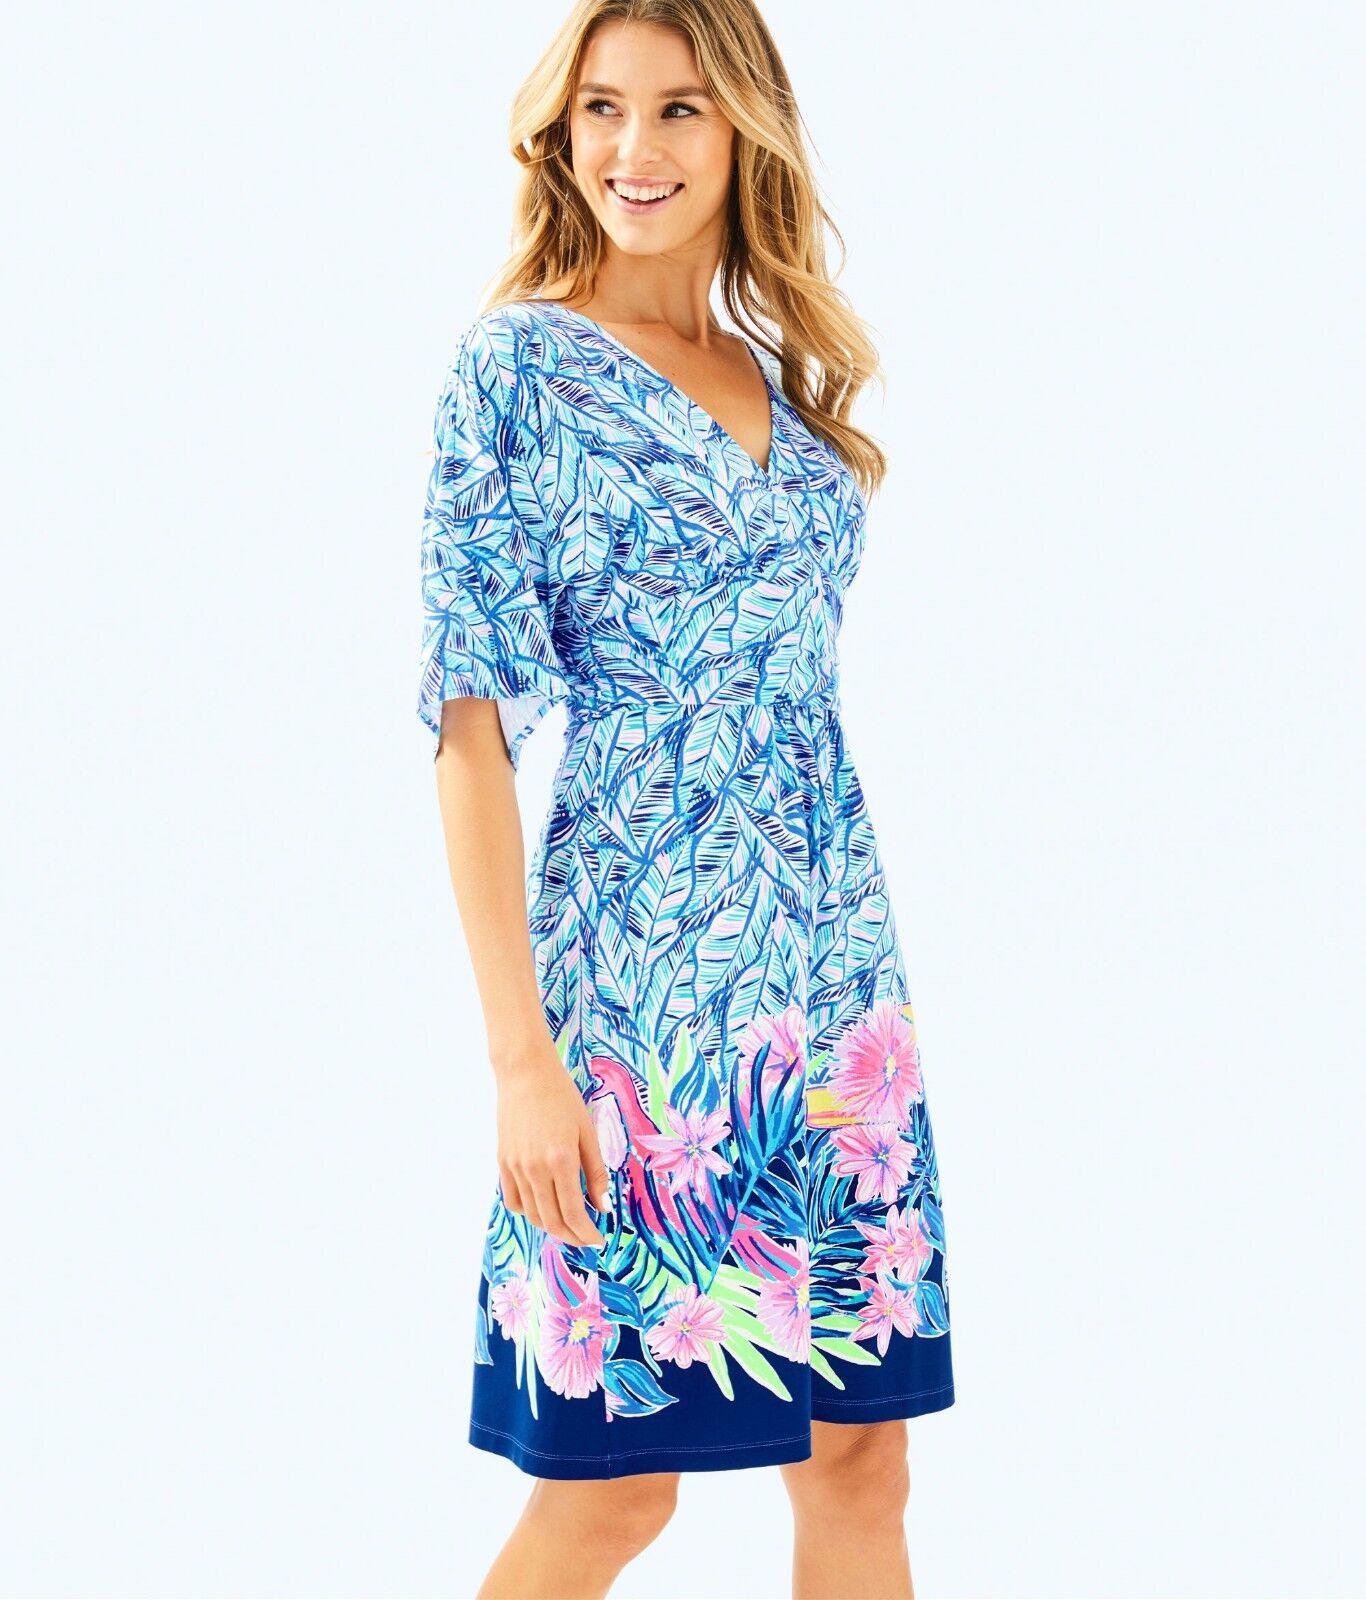 178 NEW Lilly Pulitzer PARIGI DRESS Bennet bluee bluee bluee Lets Mango Dress White M XL 73e9bb